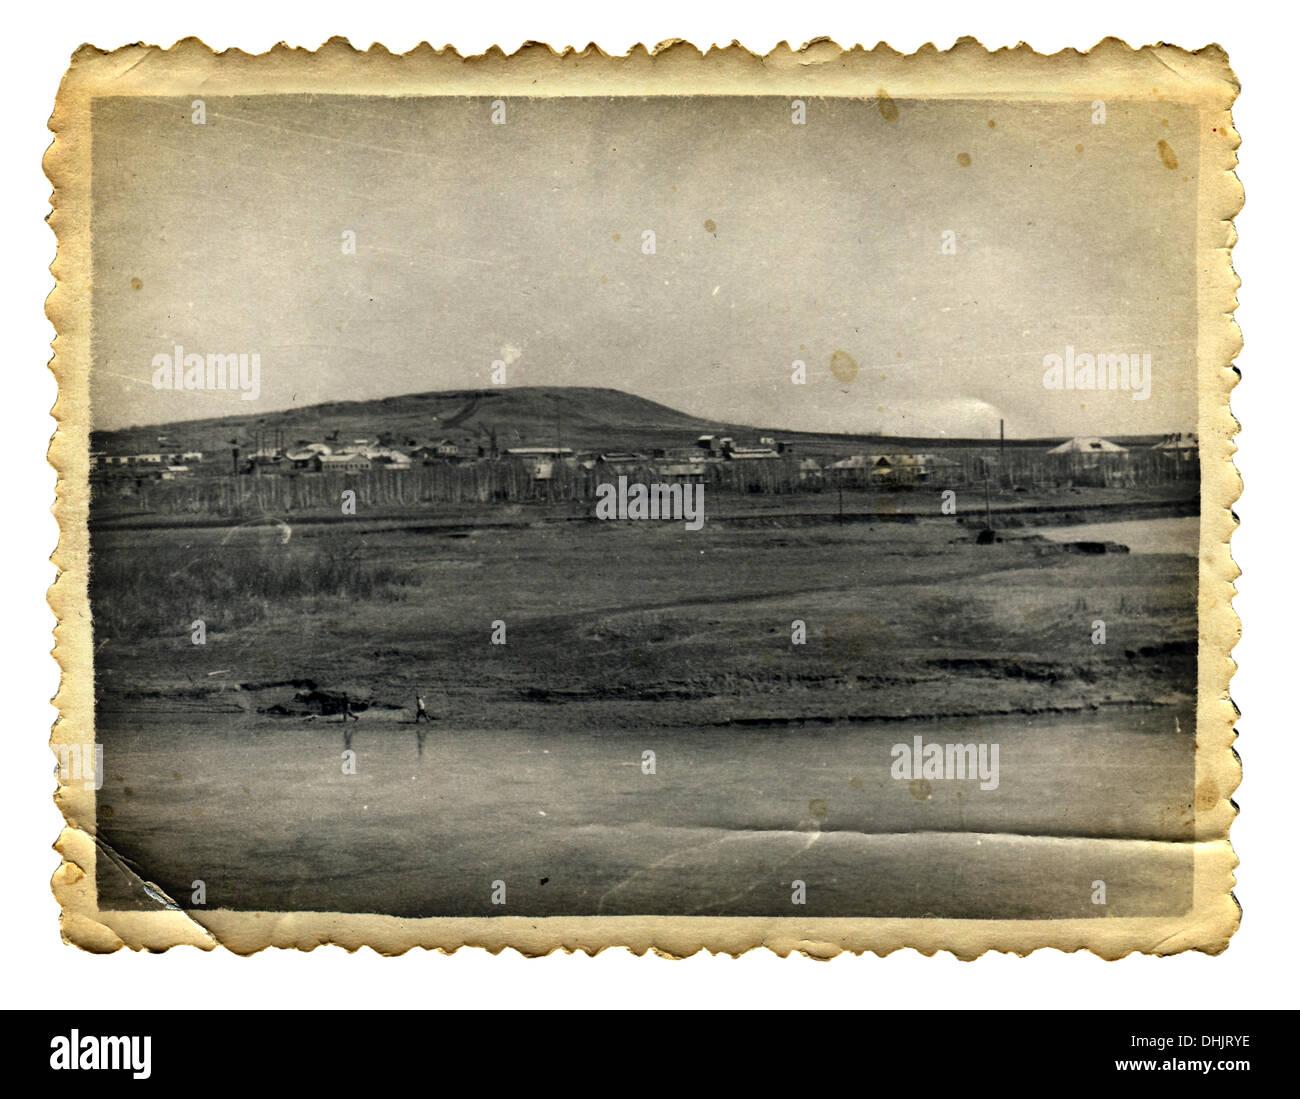 Old Photo Isolated - Stock Image